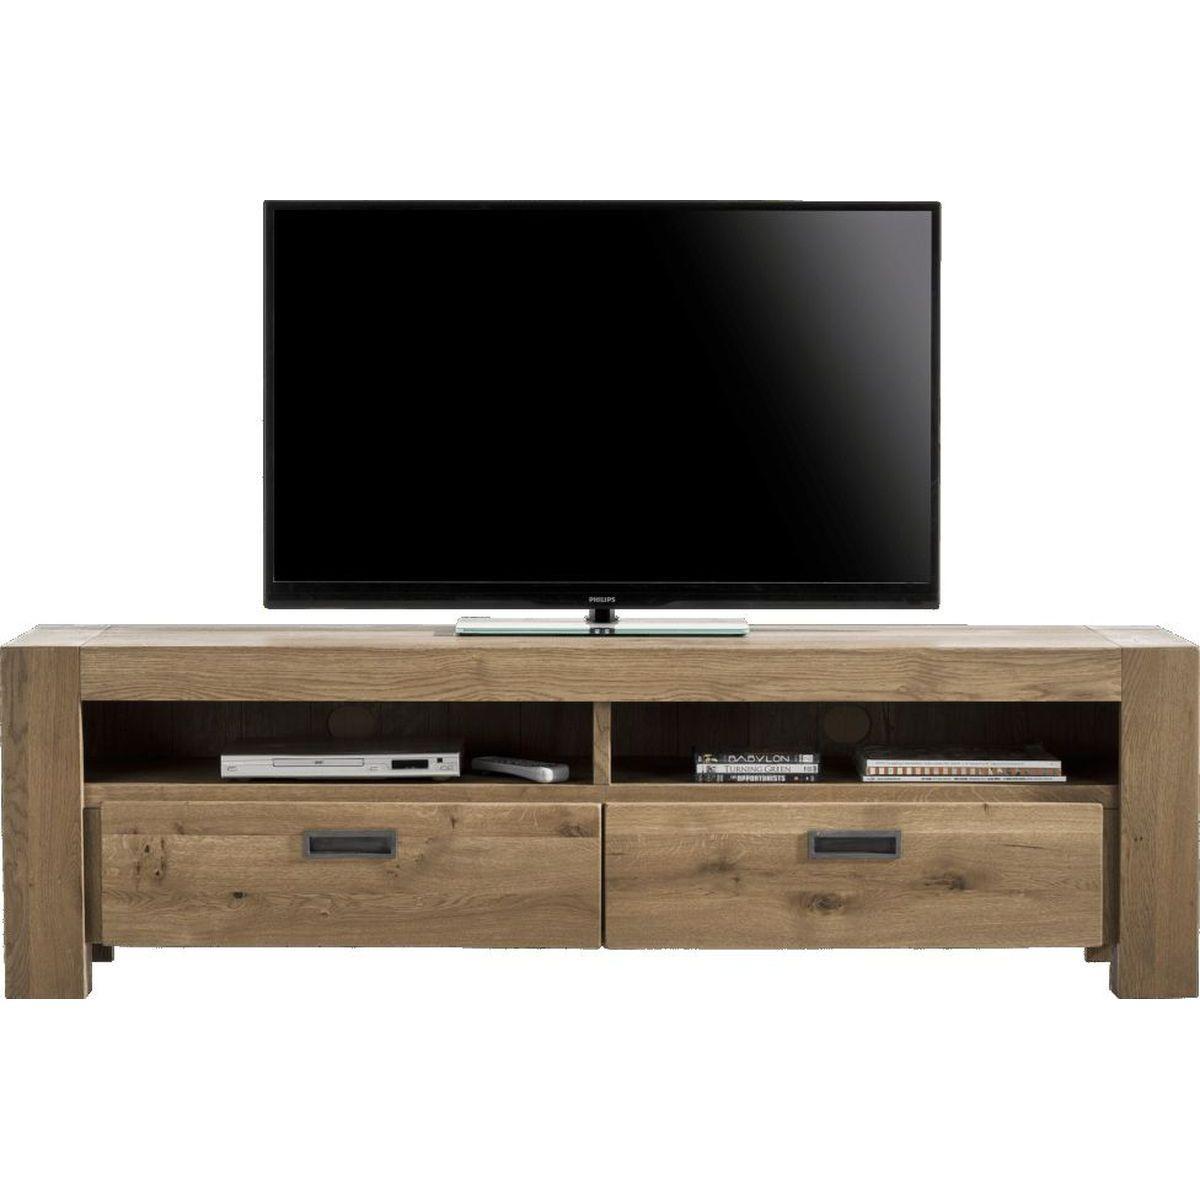 Meuble TV 180cm SANTORINI Henders & Hazel castle sand